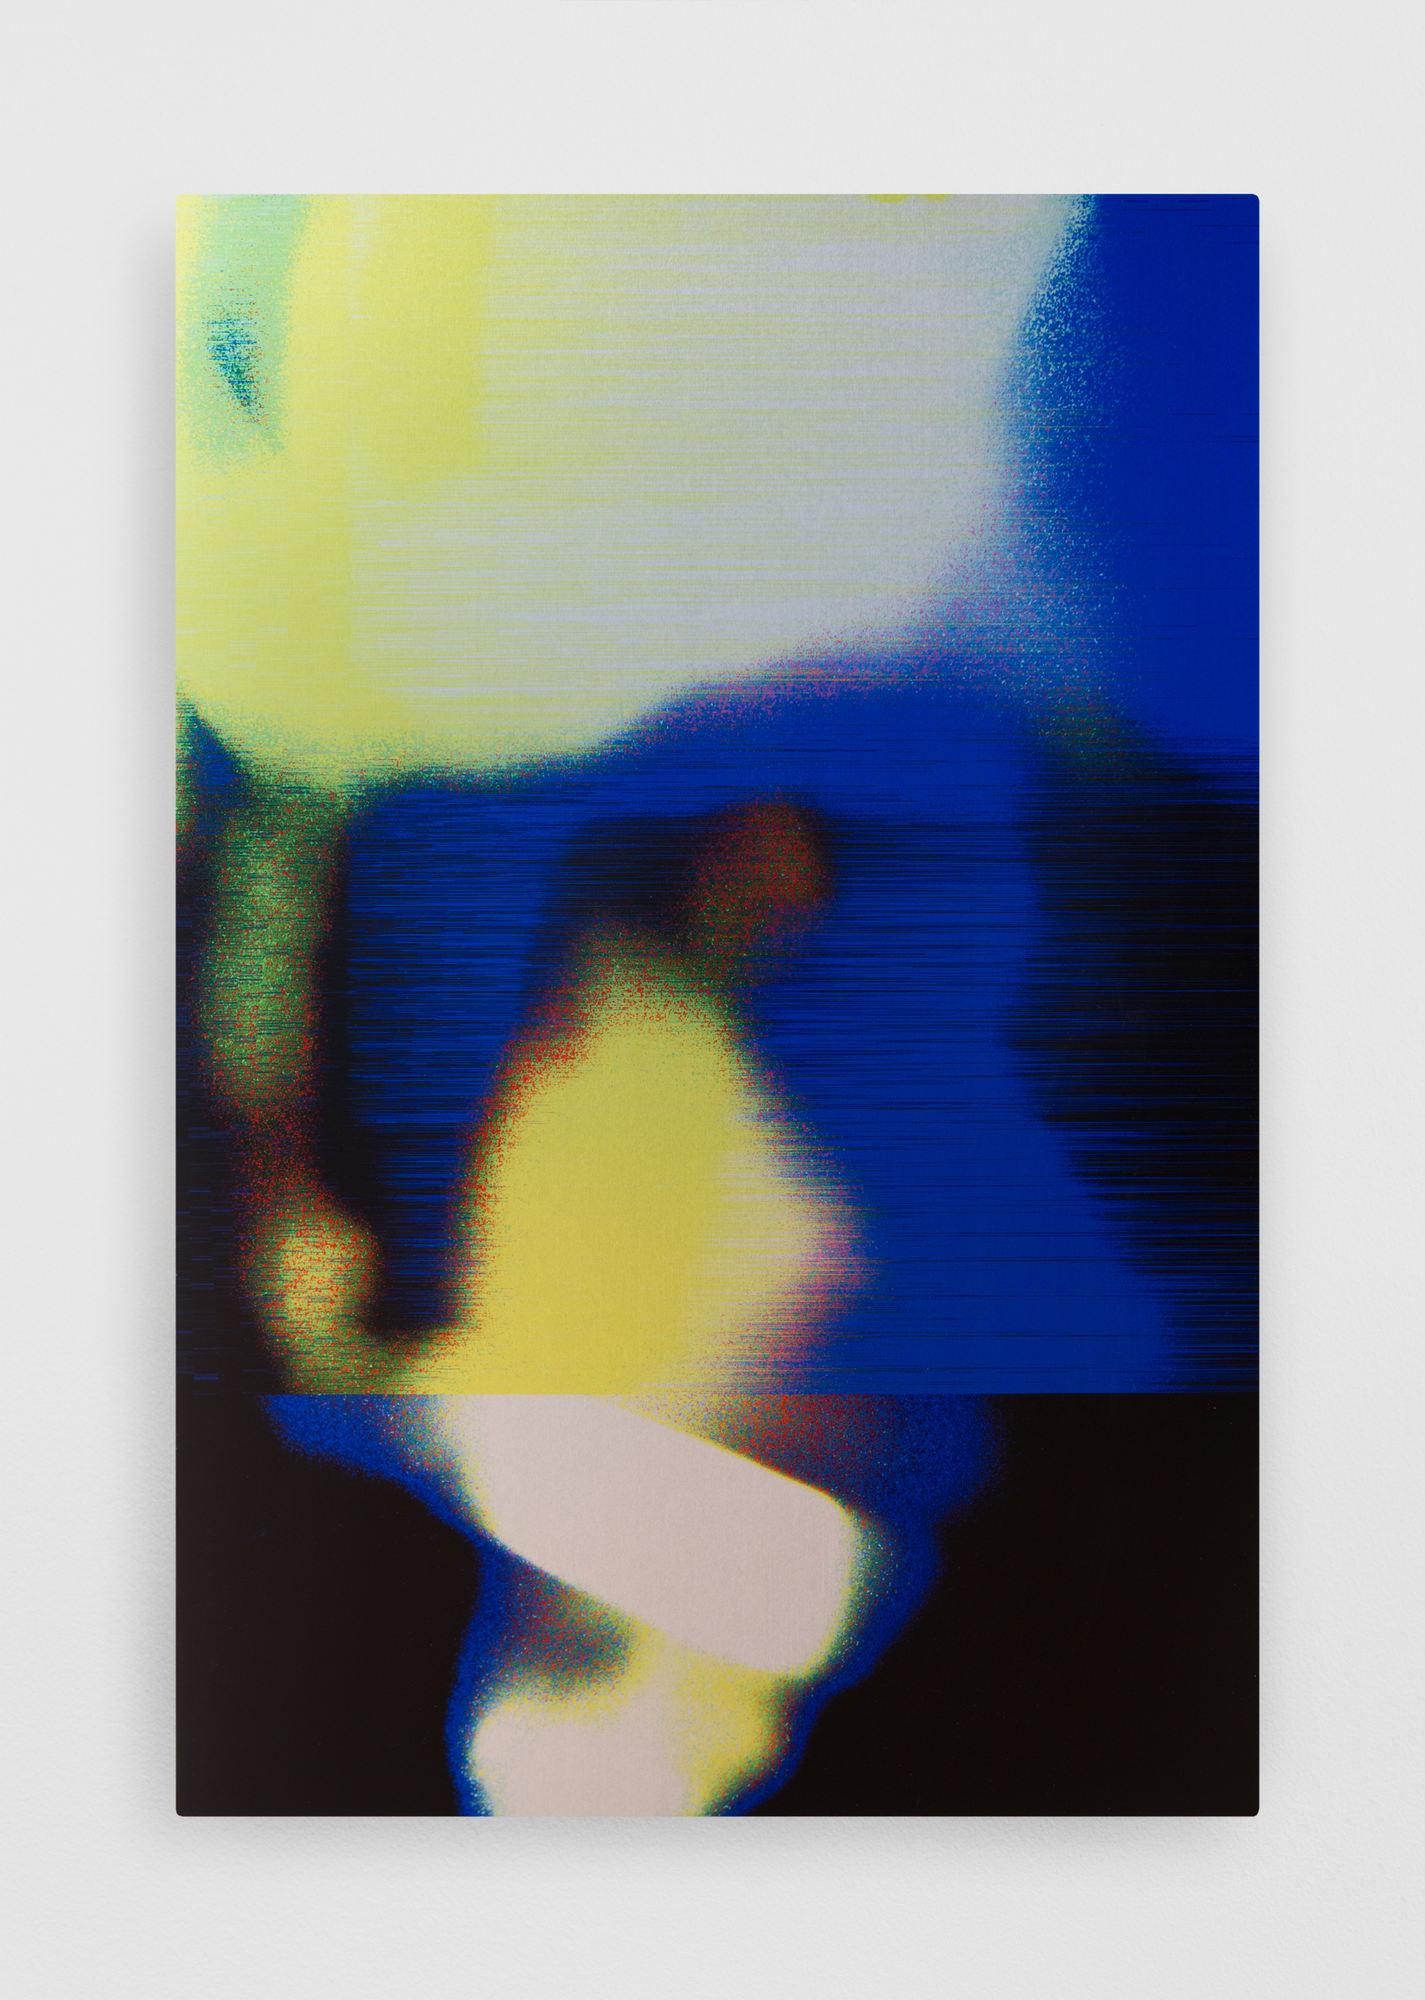 James Hoff, Skywiper No. 55, 2015